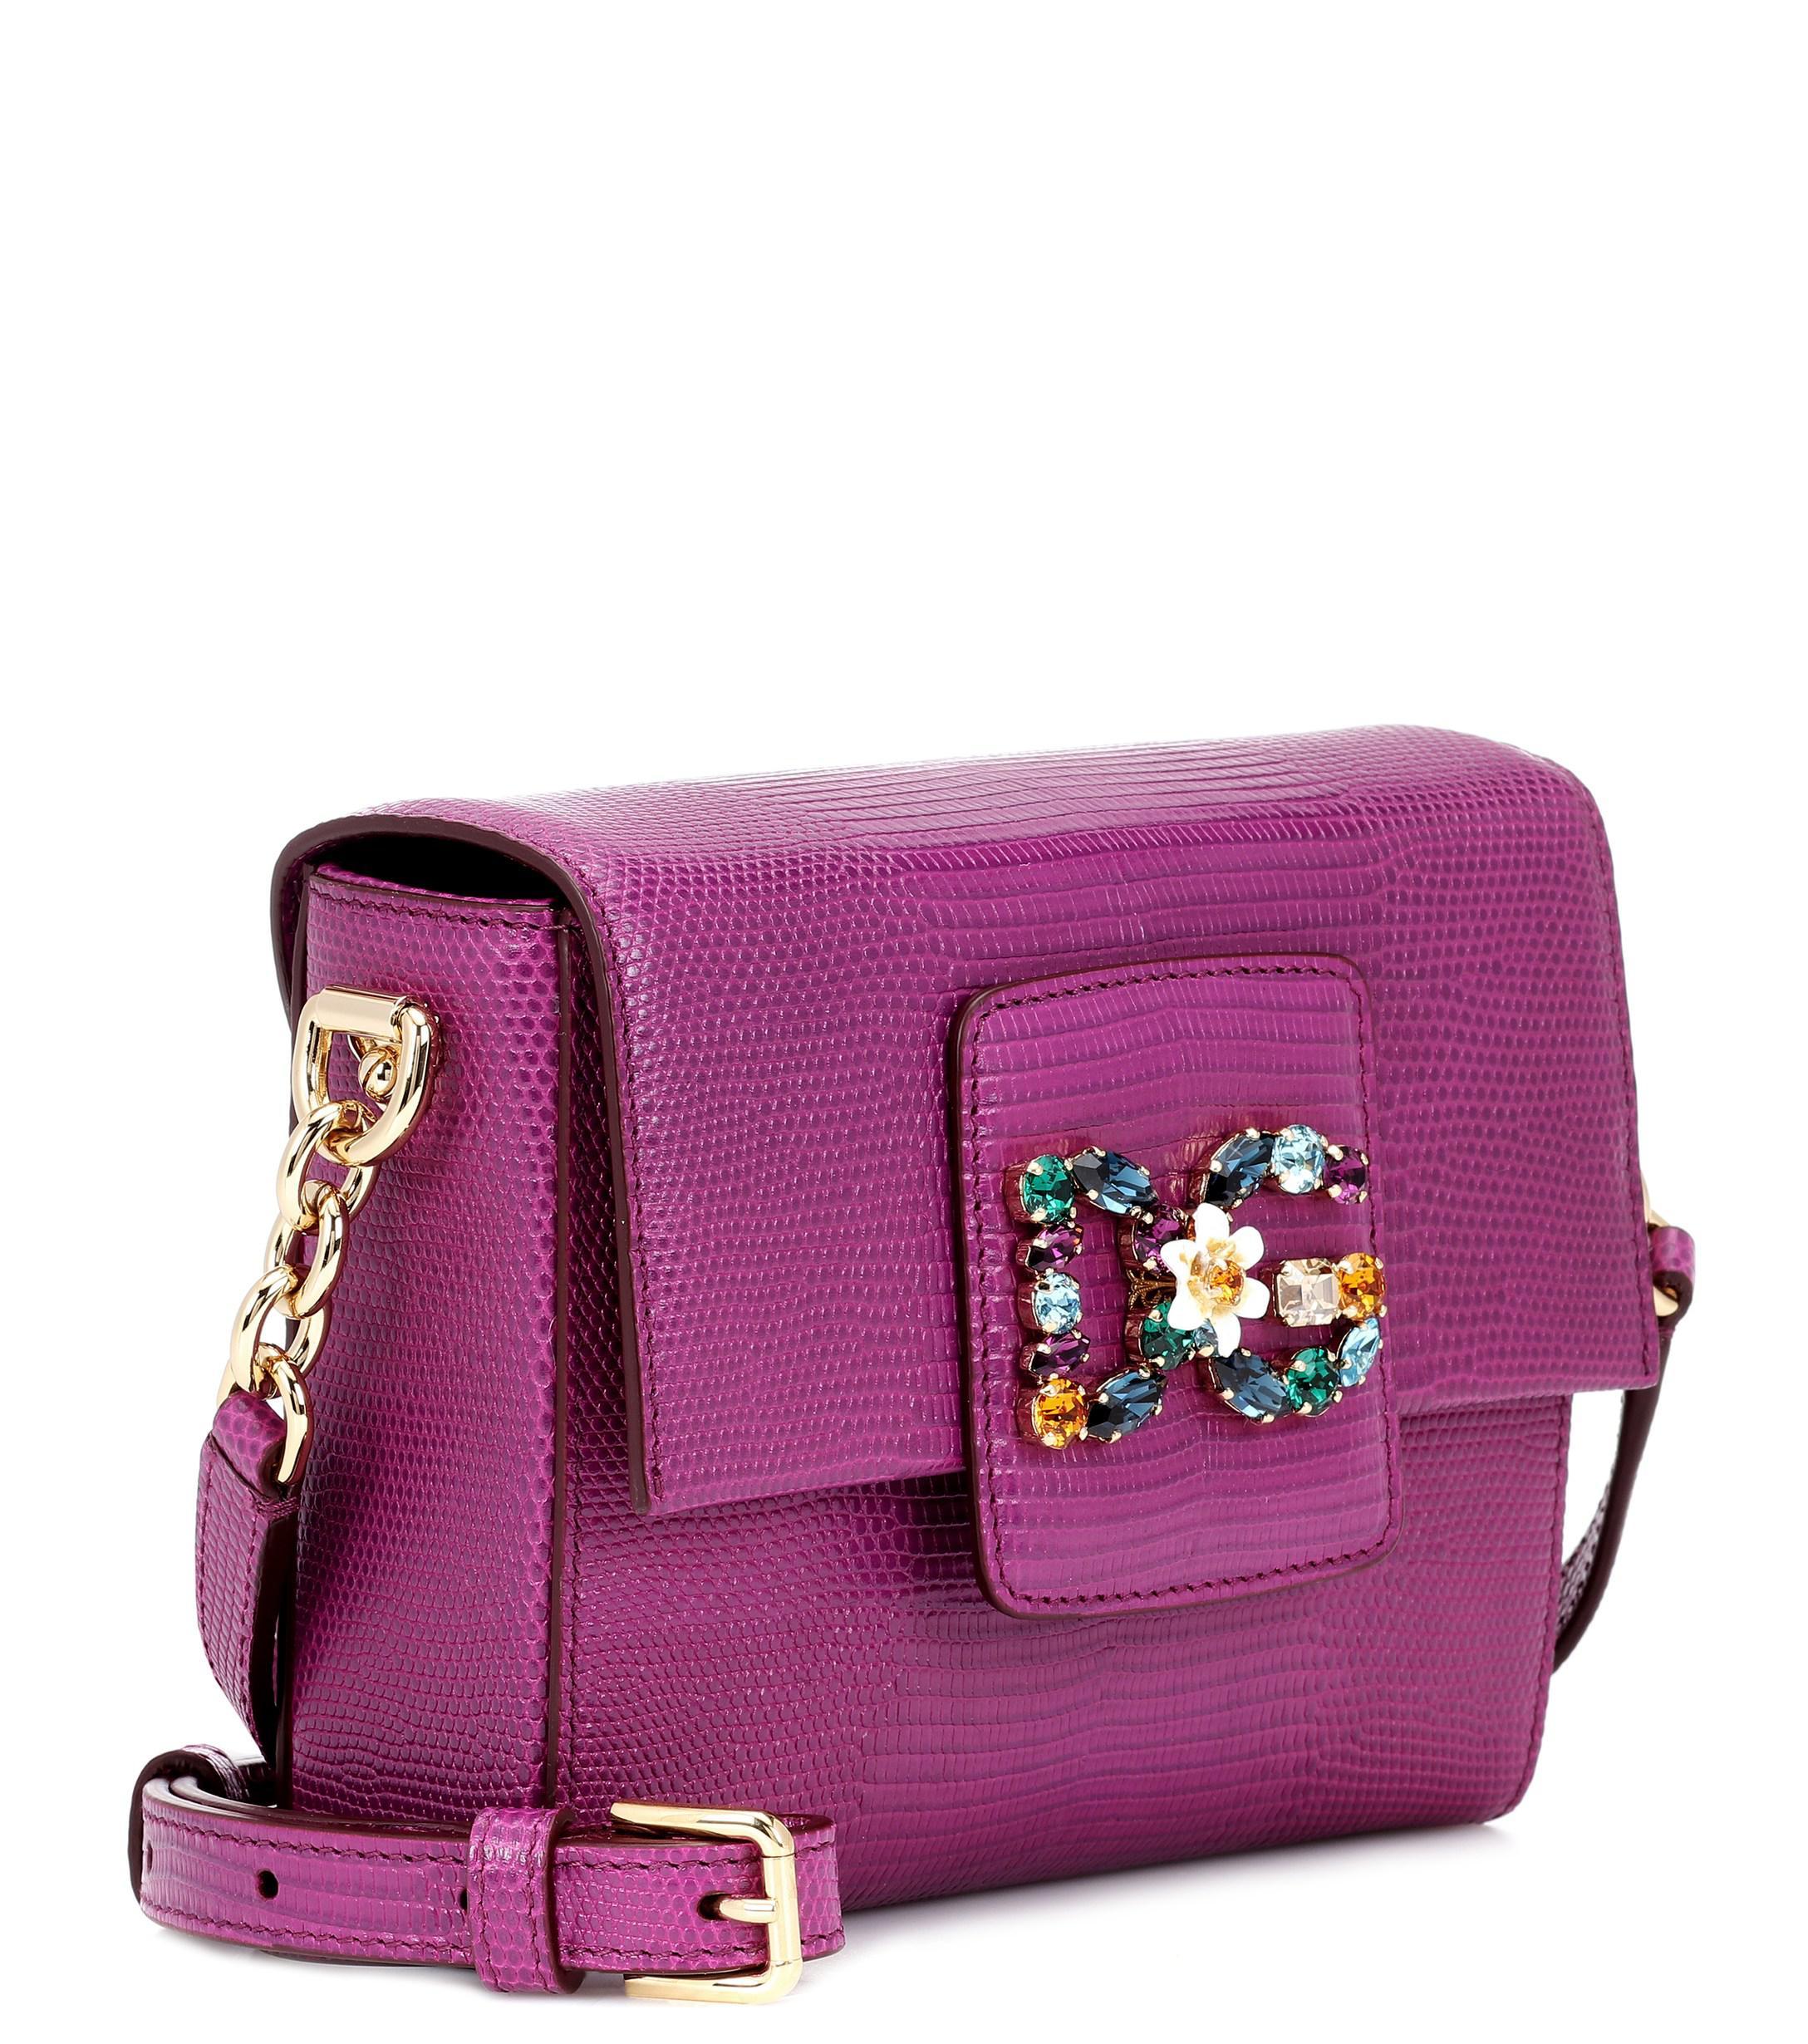 06355ee5f89 Dolce & Gabbana Dg Millennials Mini Leather Shoulder Bag in Purple ...